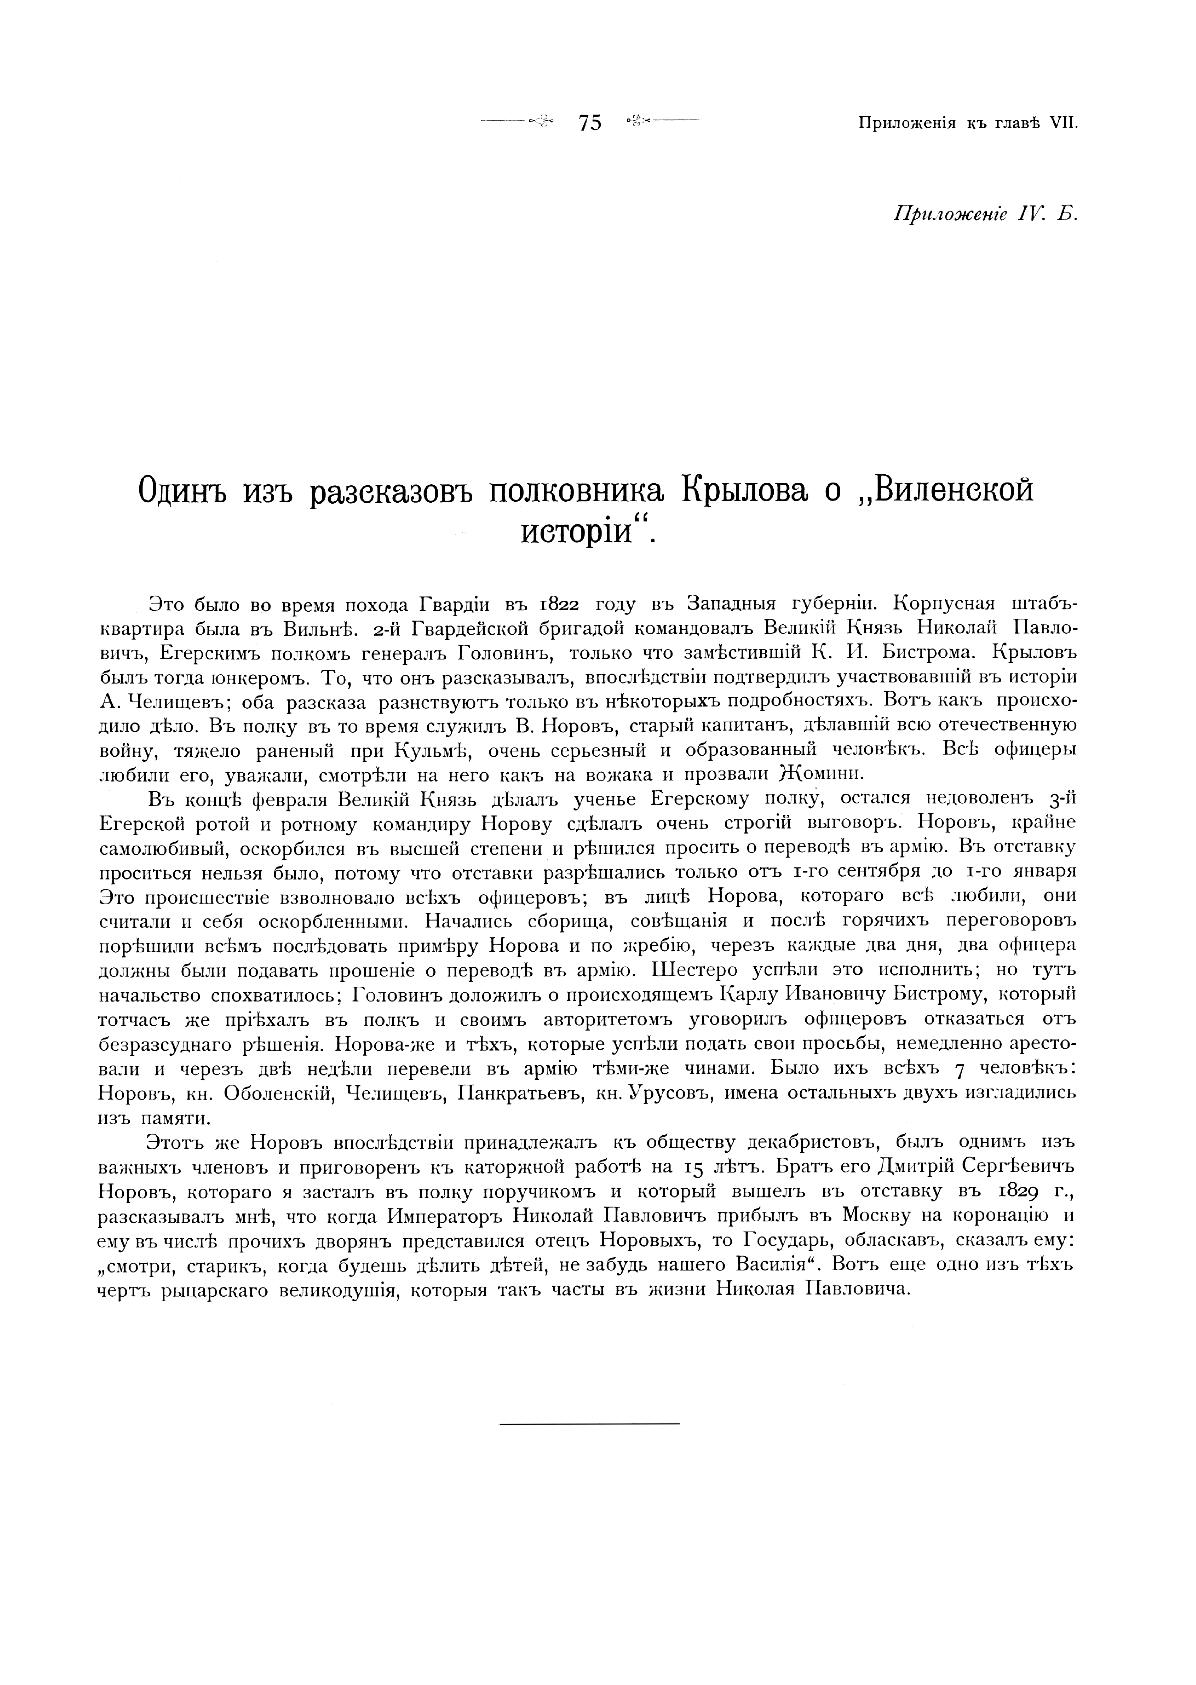 http://s5.uploads.ru/t6QNw.png